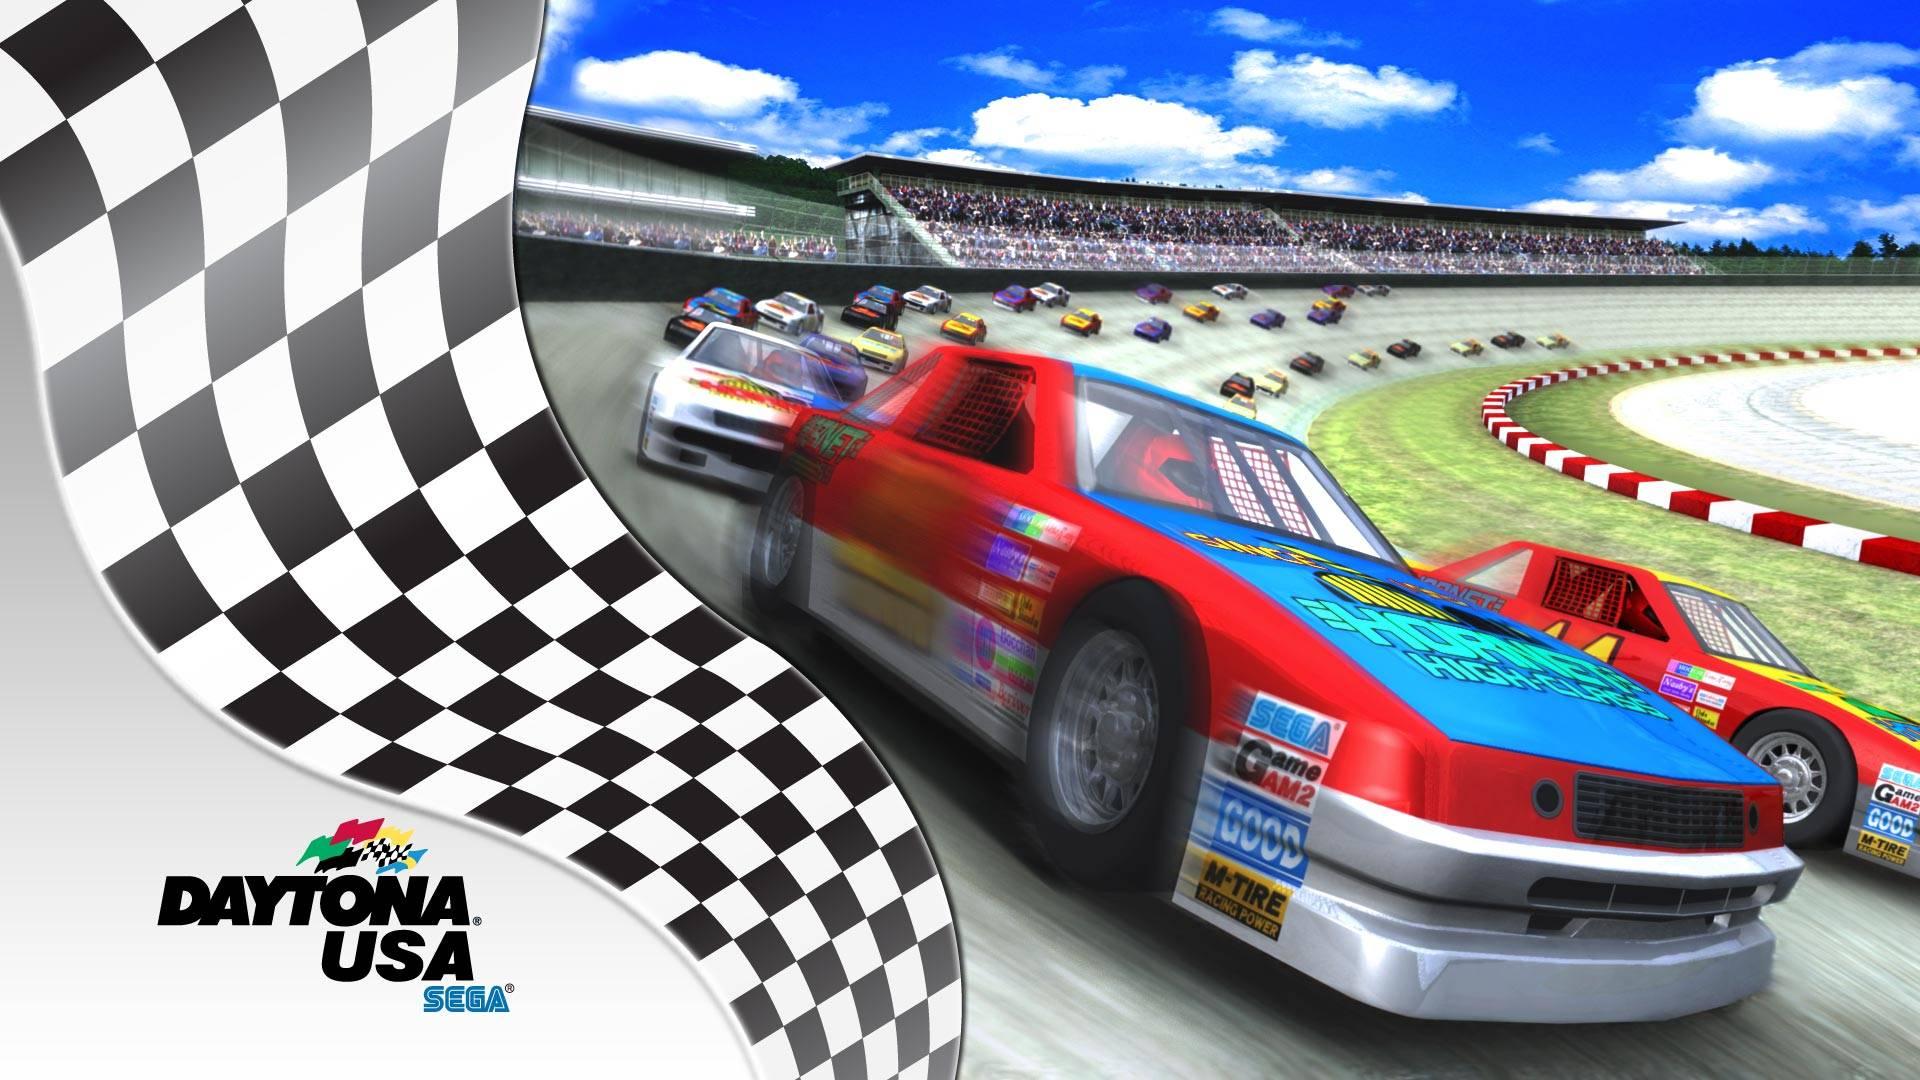 Daytona USA Sega 1993